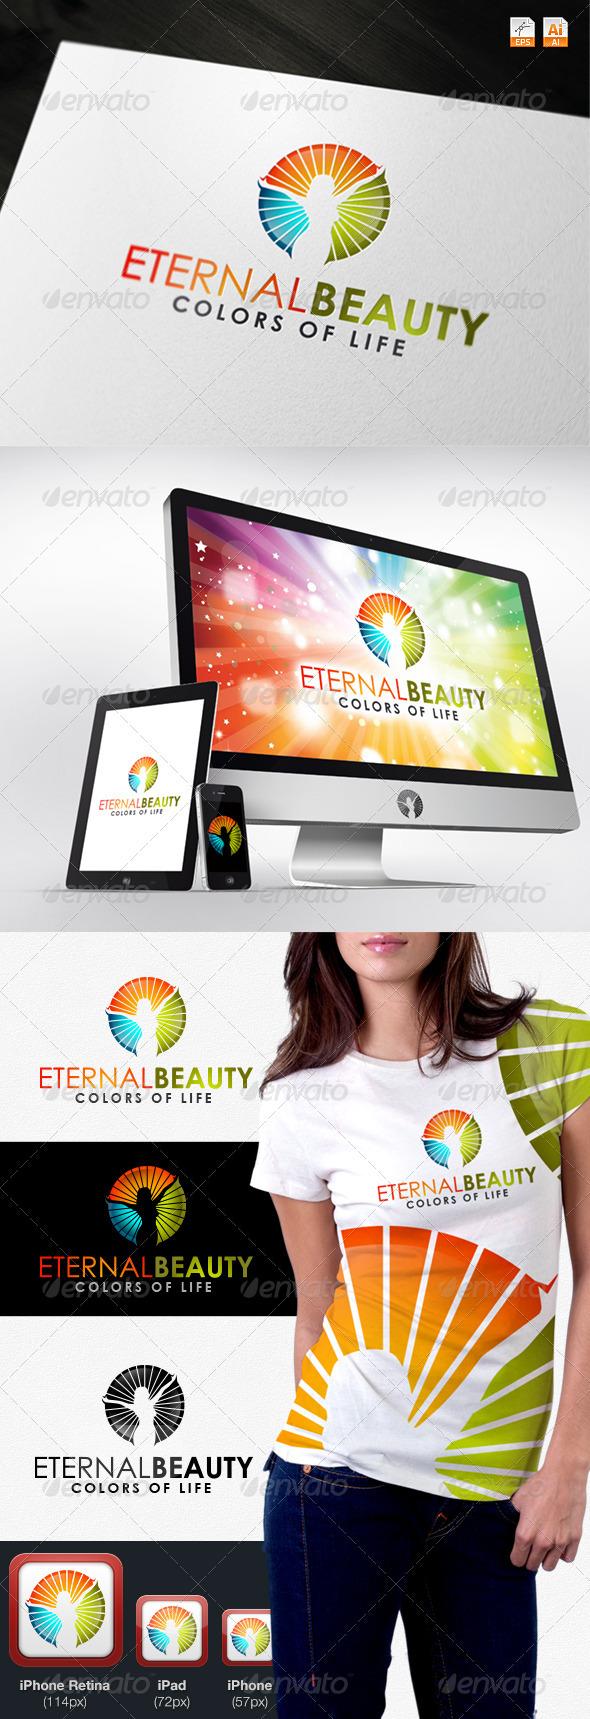 Eternal Beauty - Colors of Life Logo - Humans Logo Templates